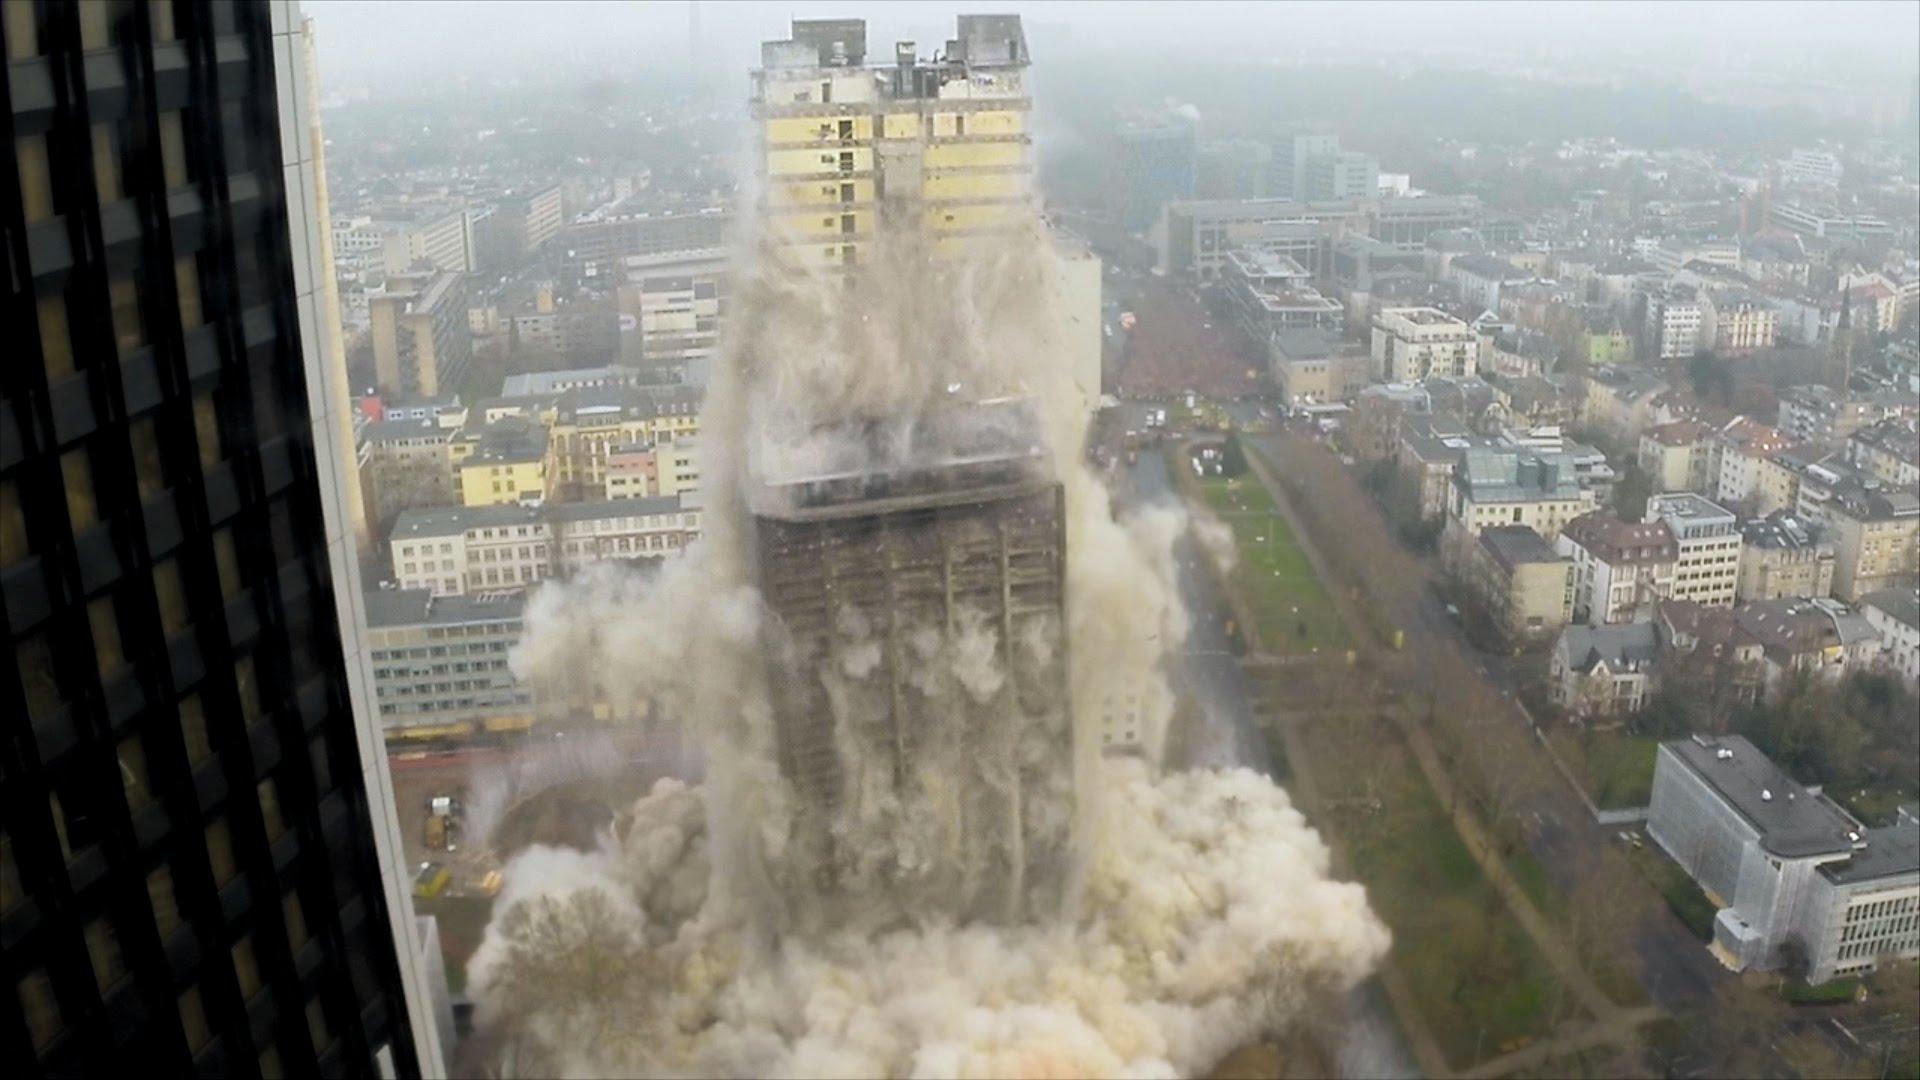 Building demolishment photo